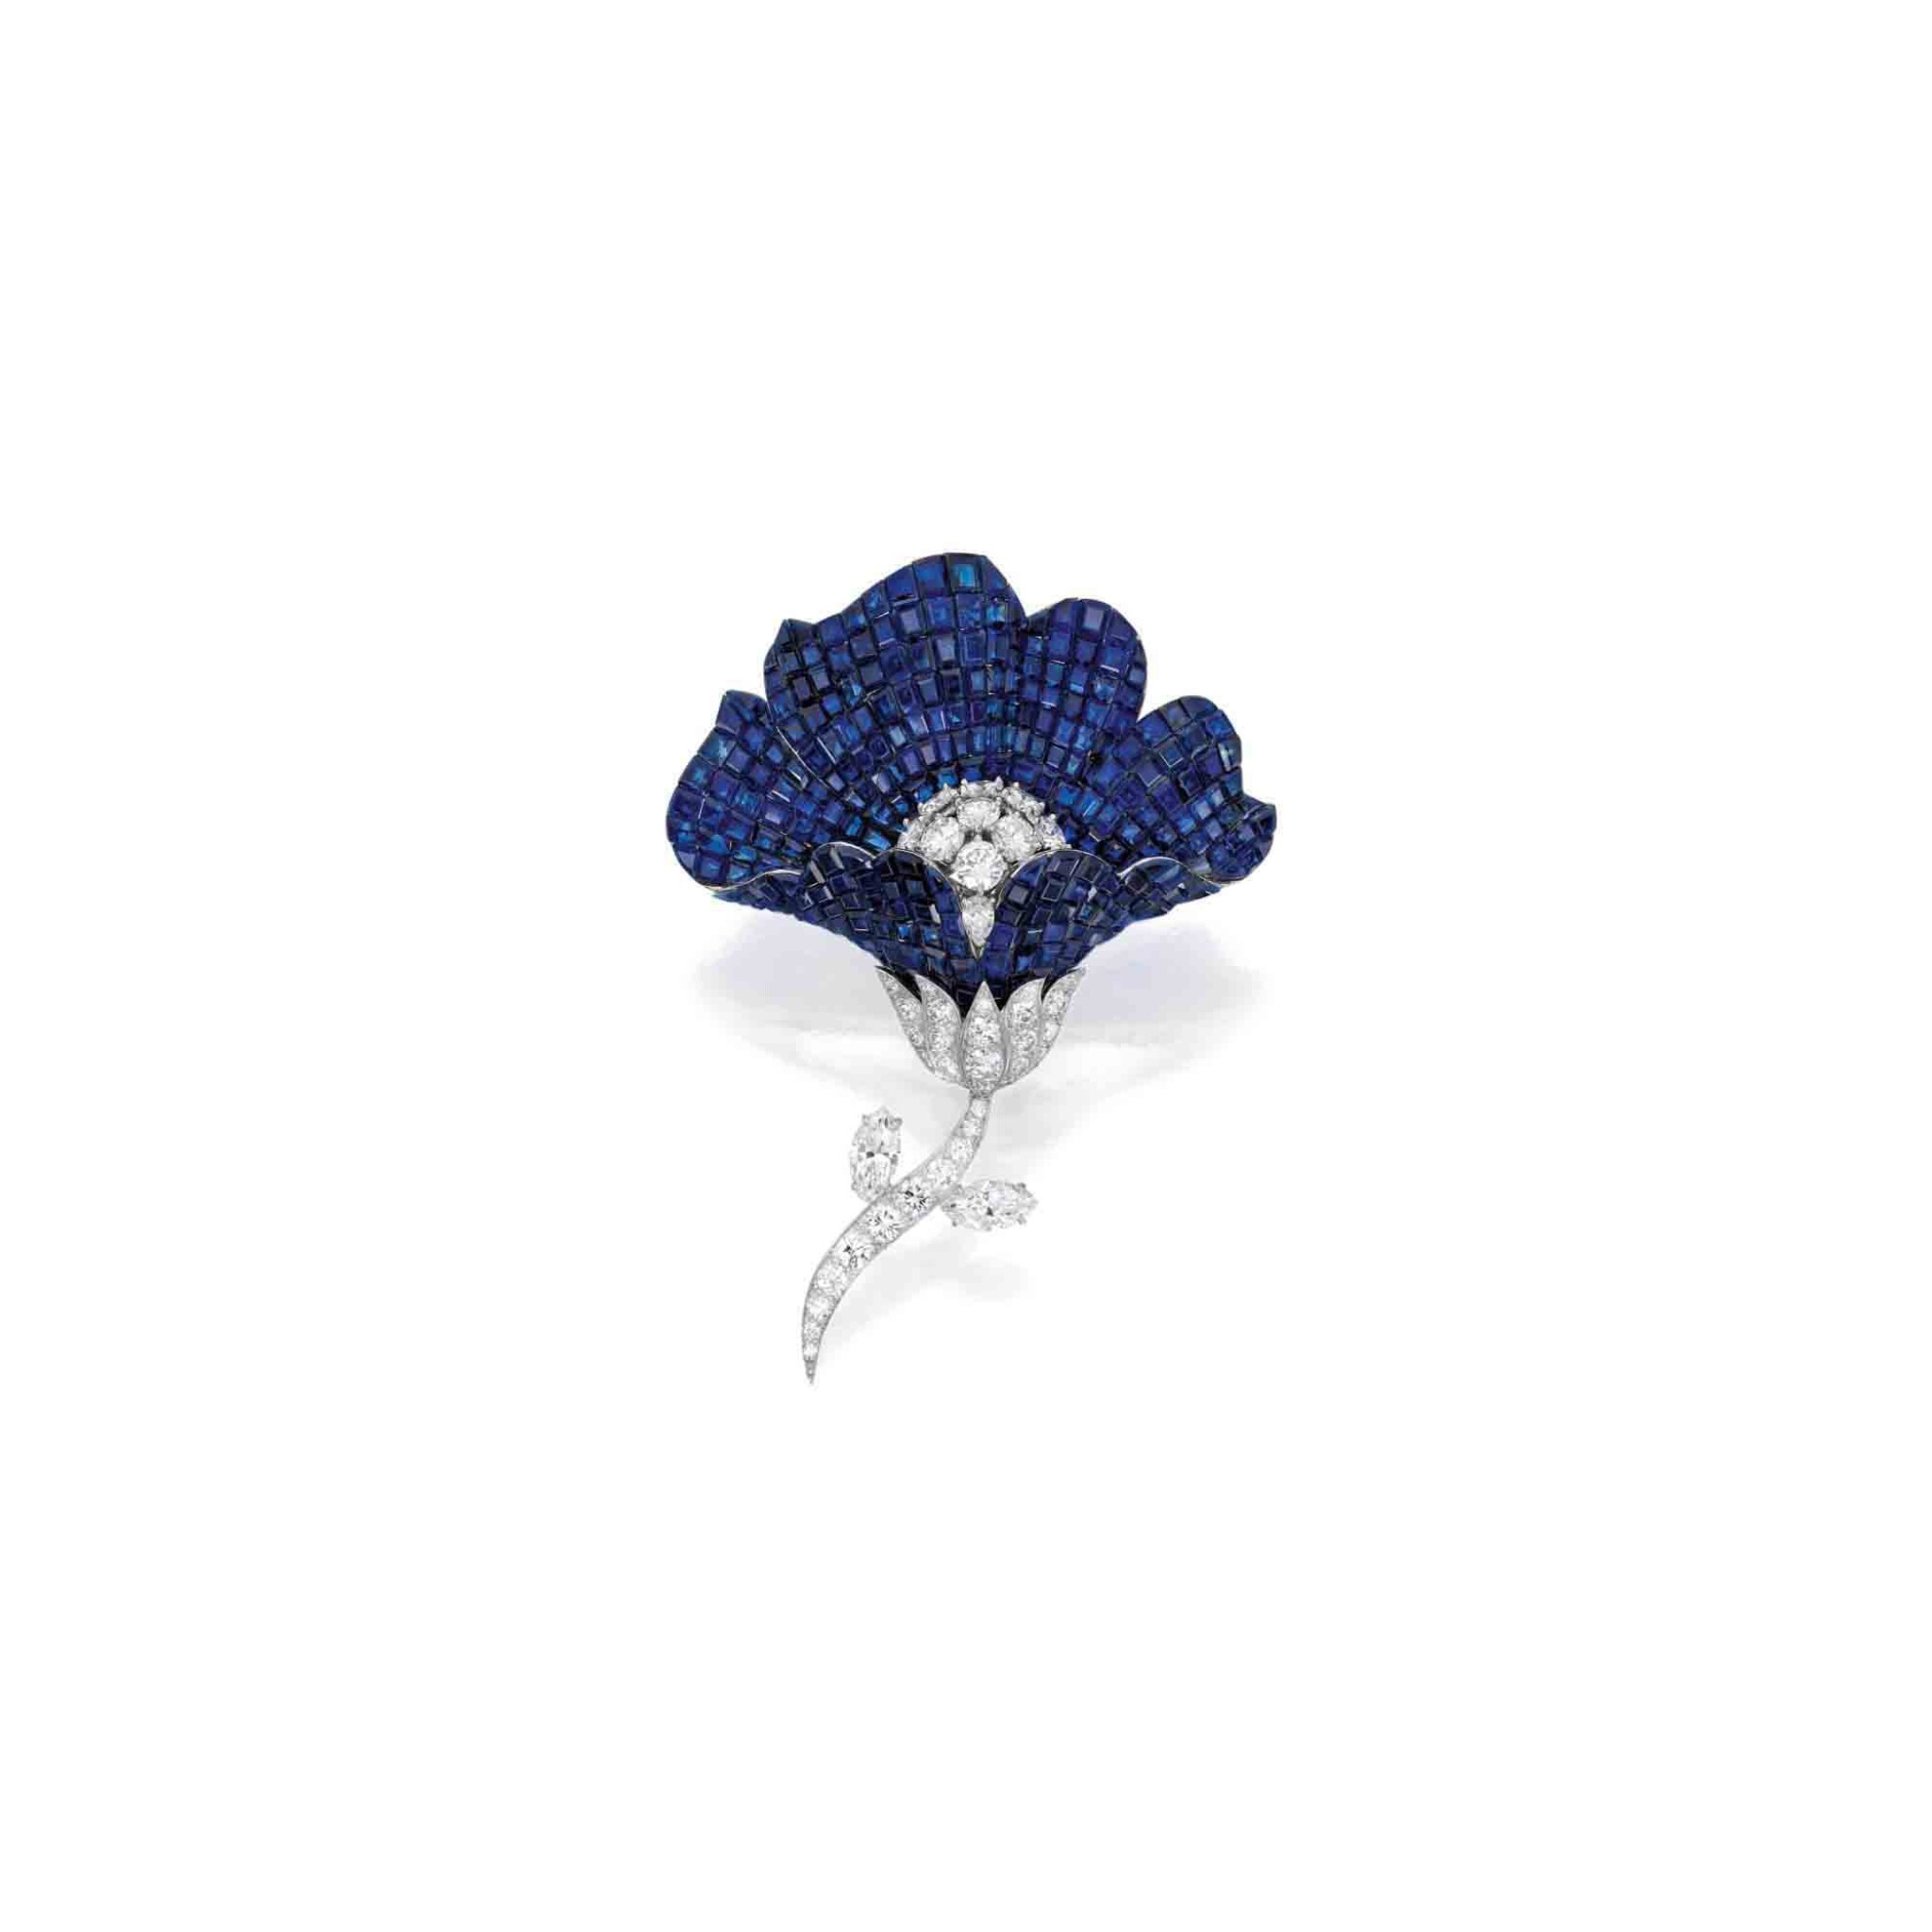 View full screen - View 1 of Lot 62. Van Cleef & Arpels [梵克雅寶] | Mystery-Set Sapphire and Diamond Brooch [藍寶石配鑽石別針].